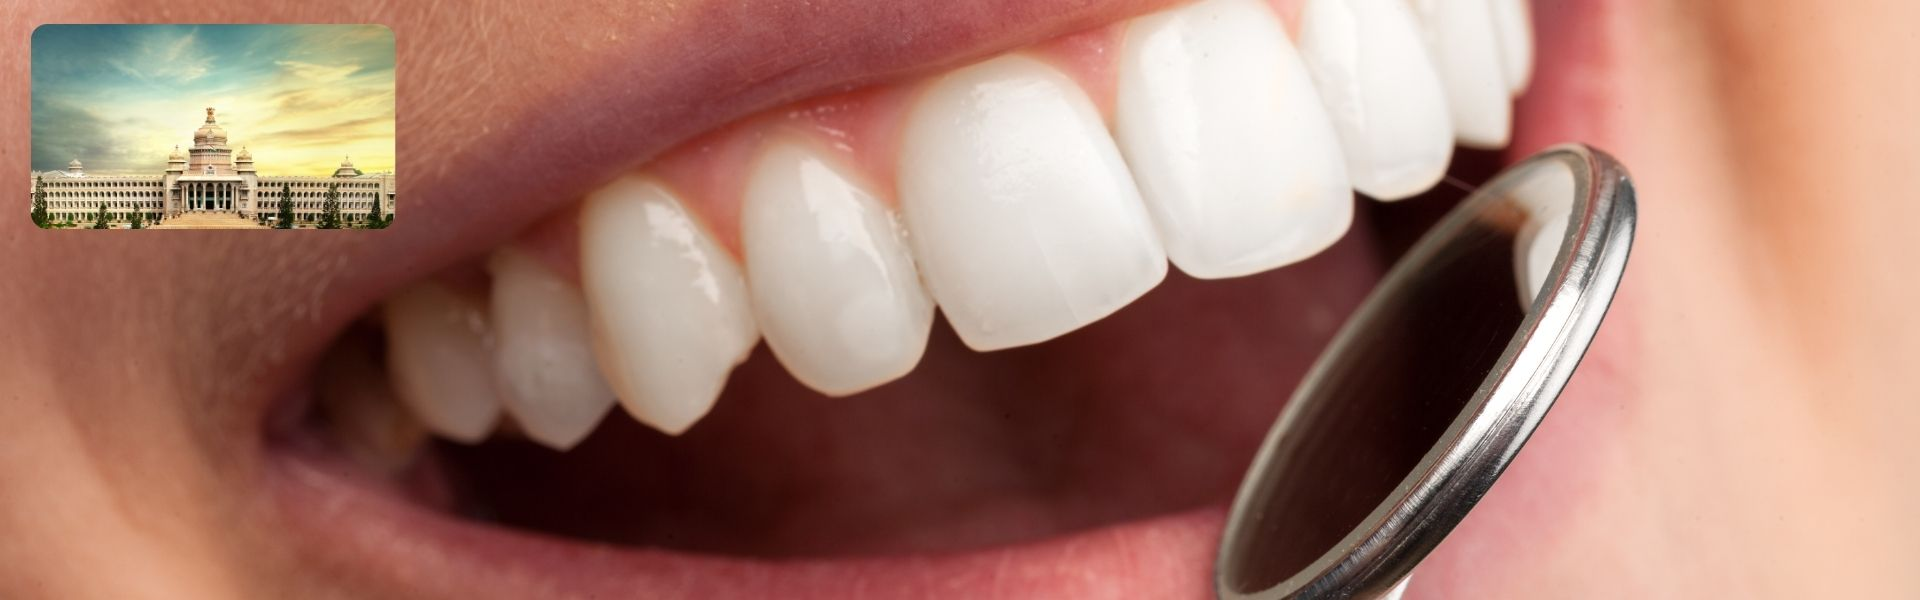 Dentist-Clinics-In-Bangalore